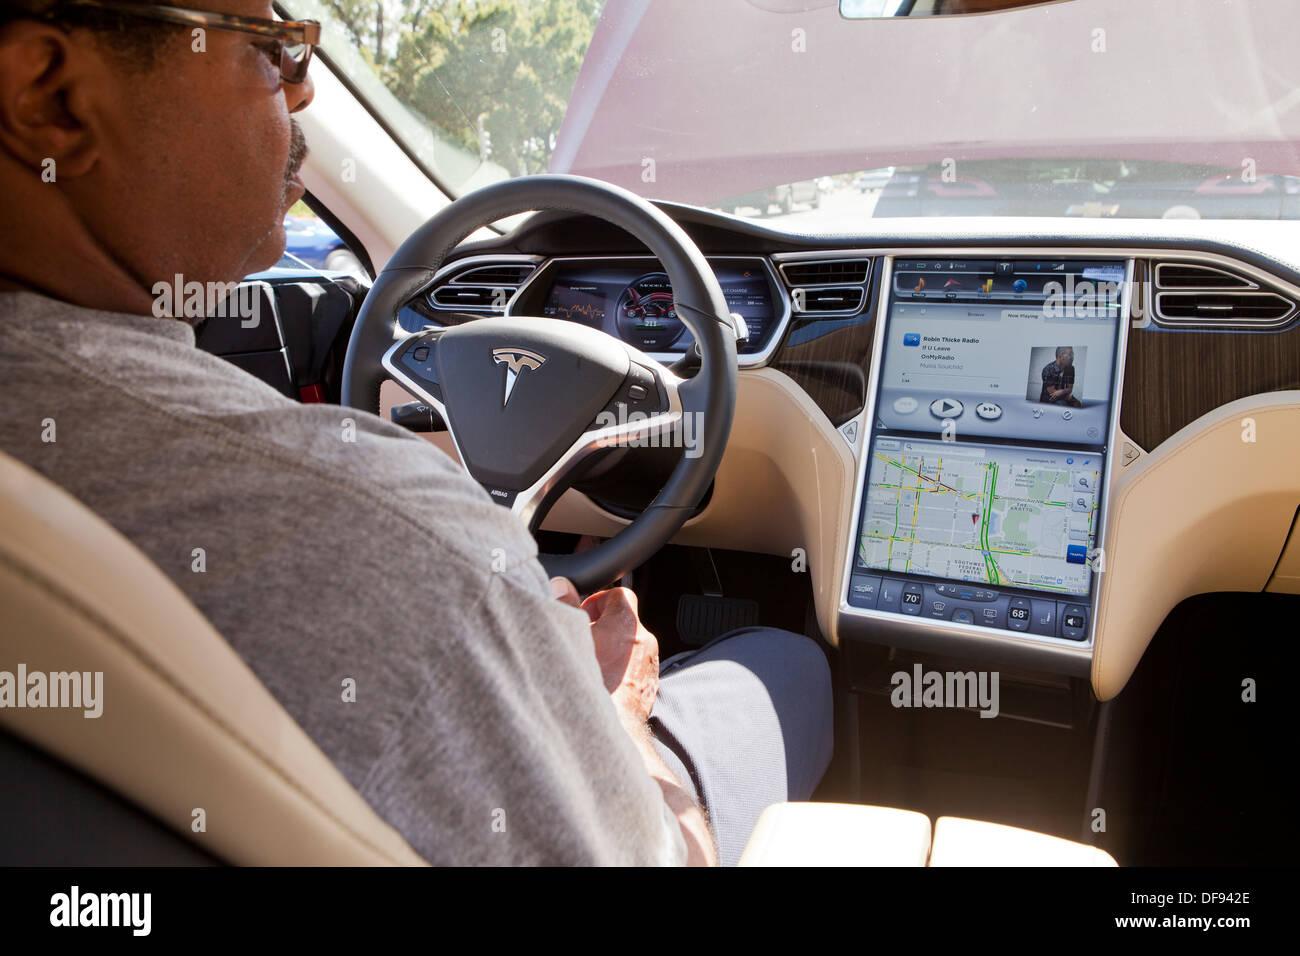 tesla model s electric car interior stock photo 61051718 alamy. Black Bedroom Furniture Sets. Home Design Ideas